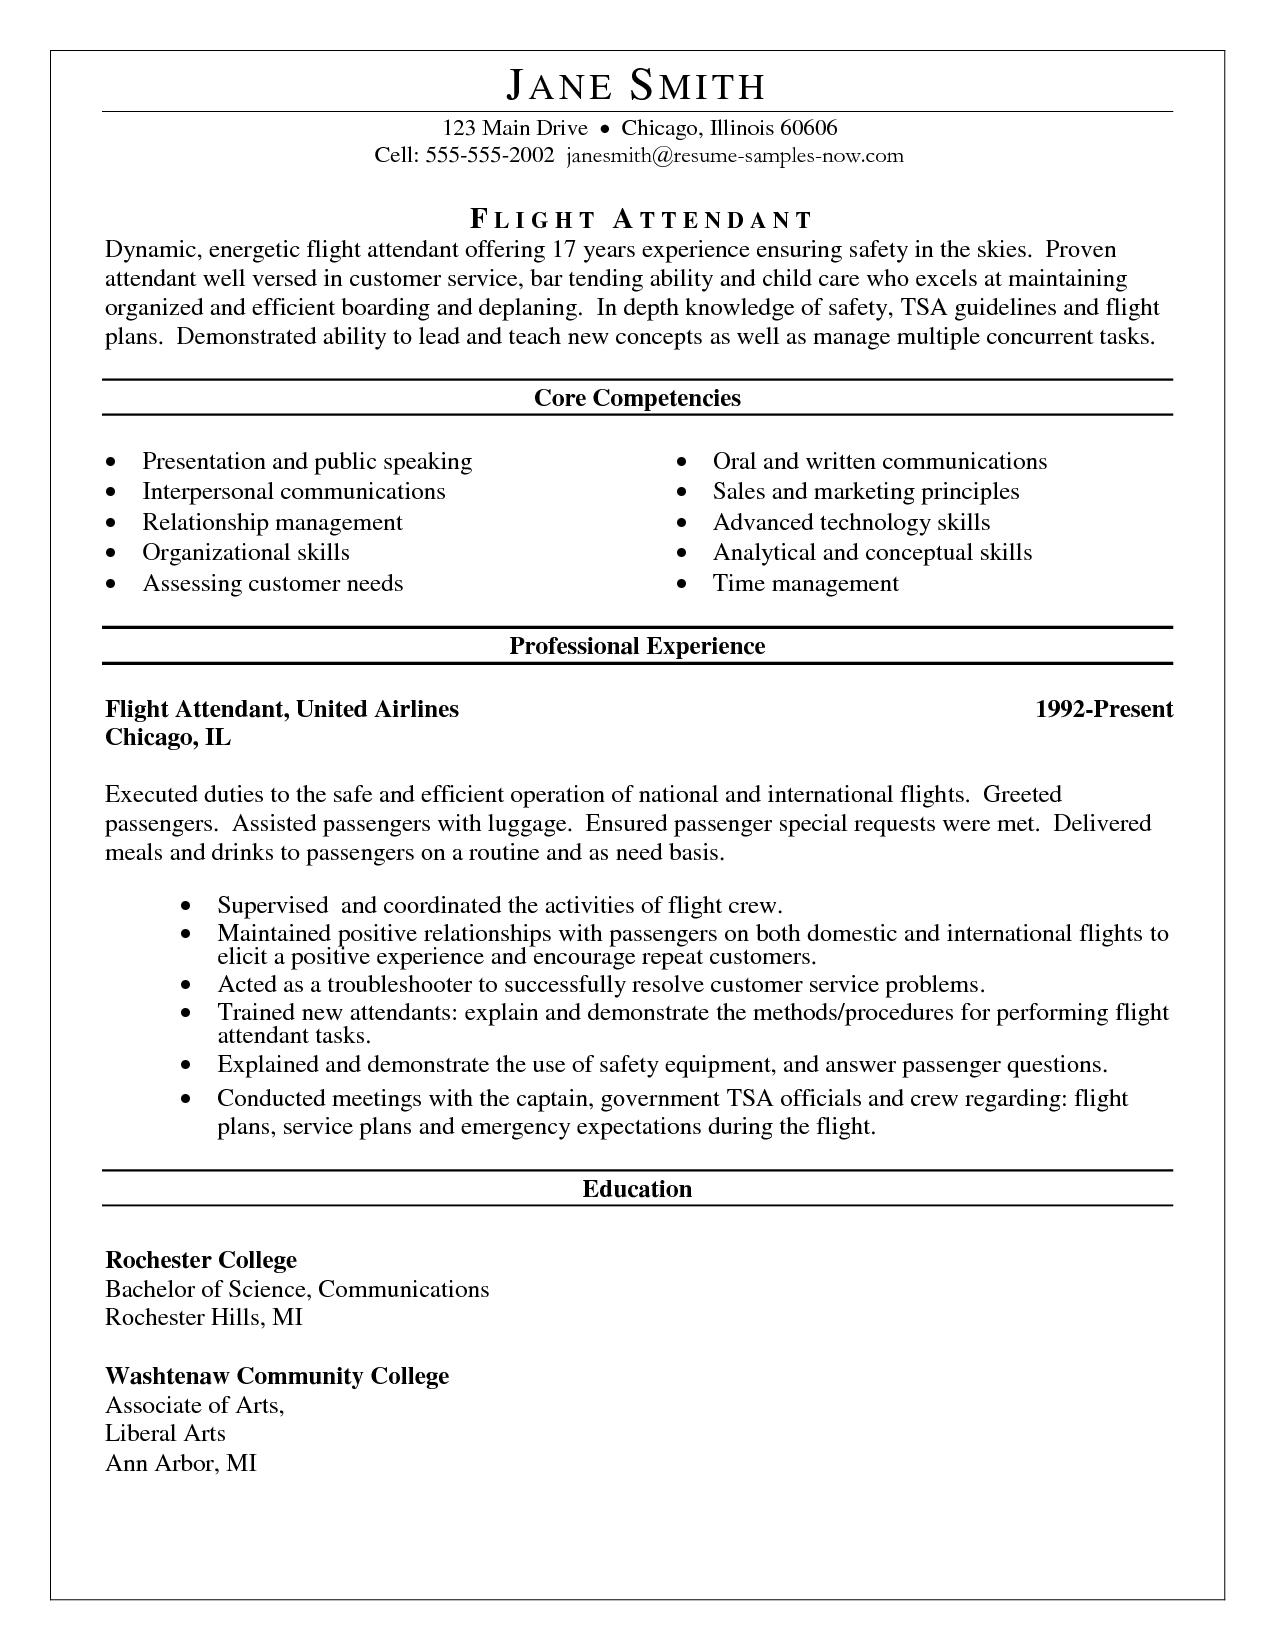 Resume Examples Key Competencies Competencies Examples Resume Resumeexamples Teacher Resume Examples Flight Attendant Resume Resume Examples